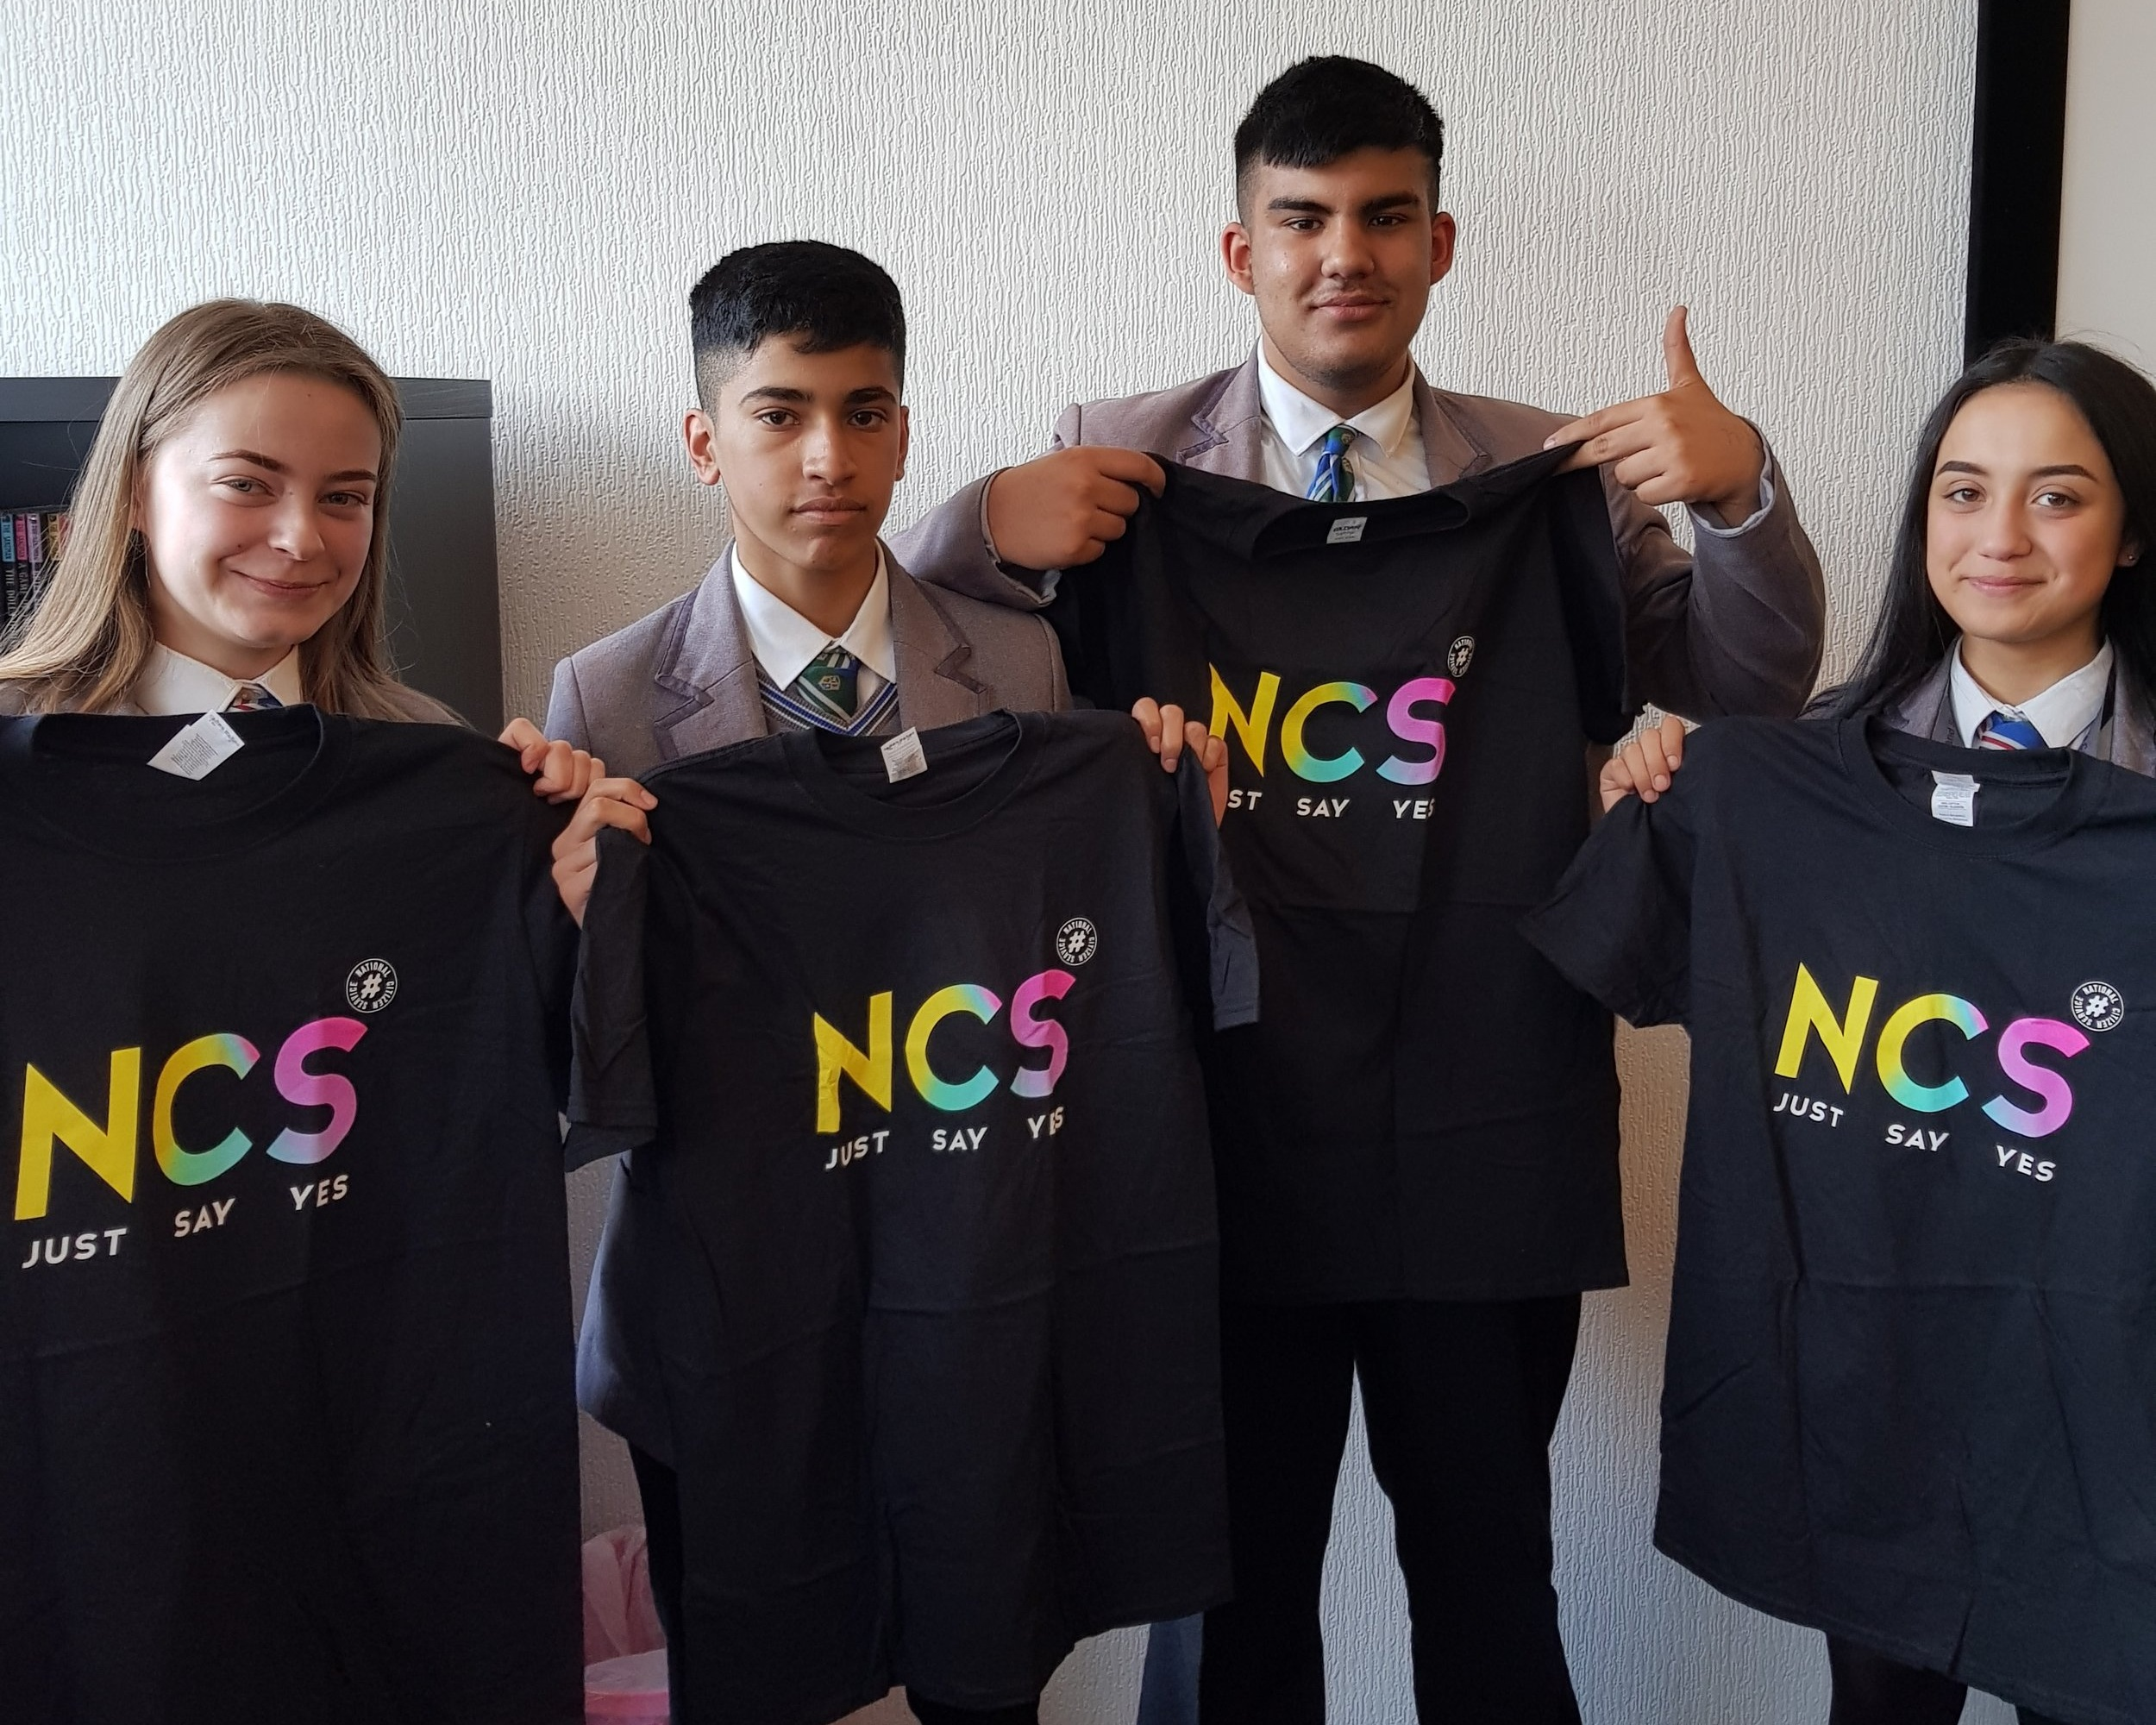 NCS+T-shirts